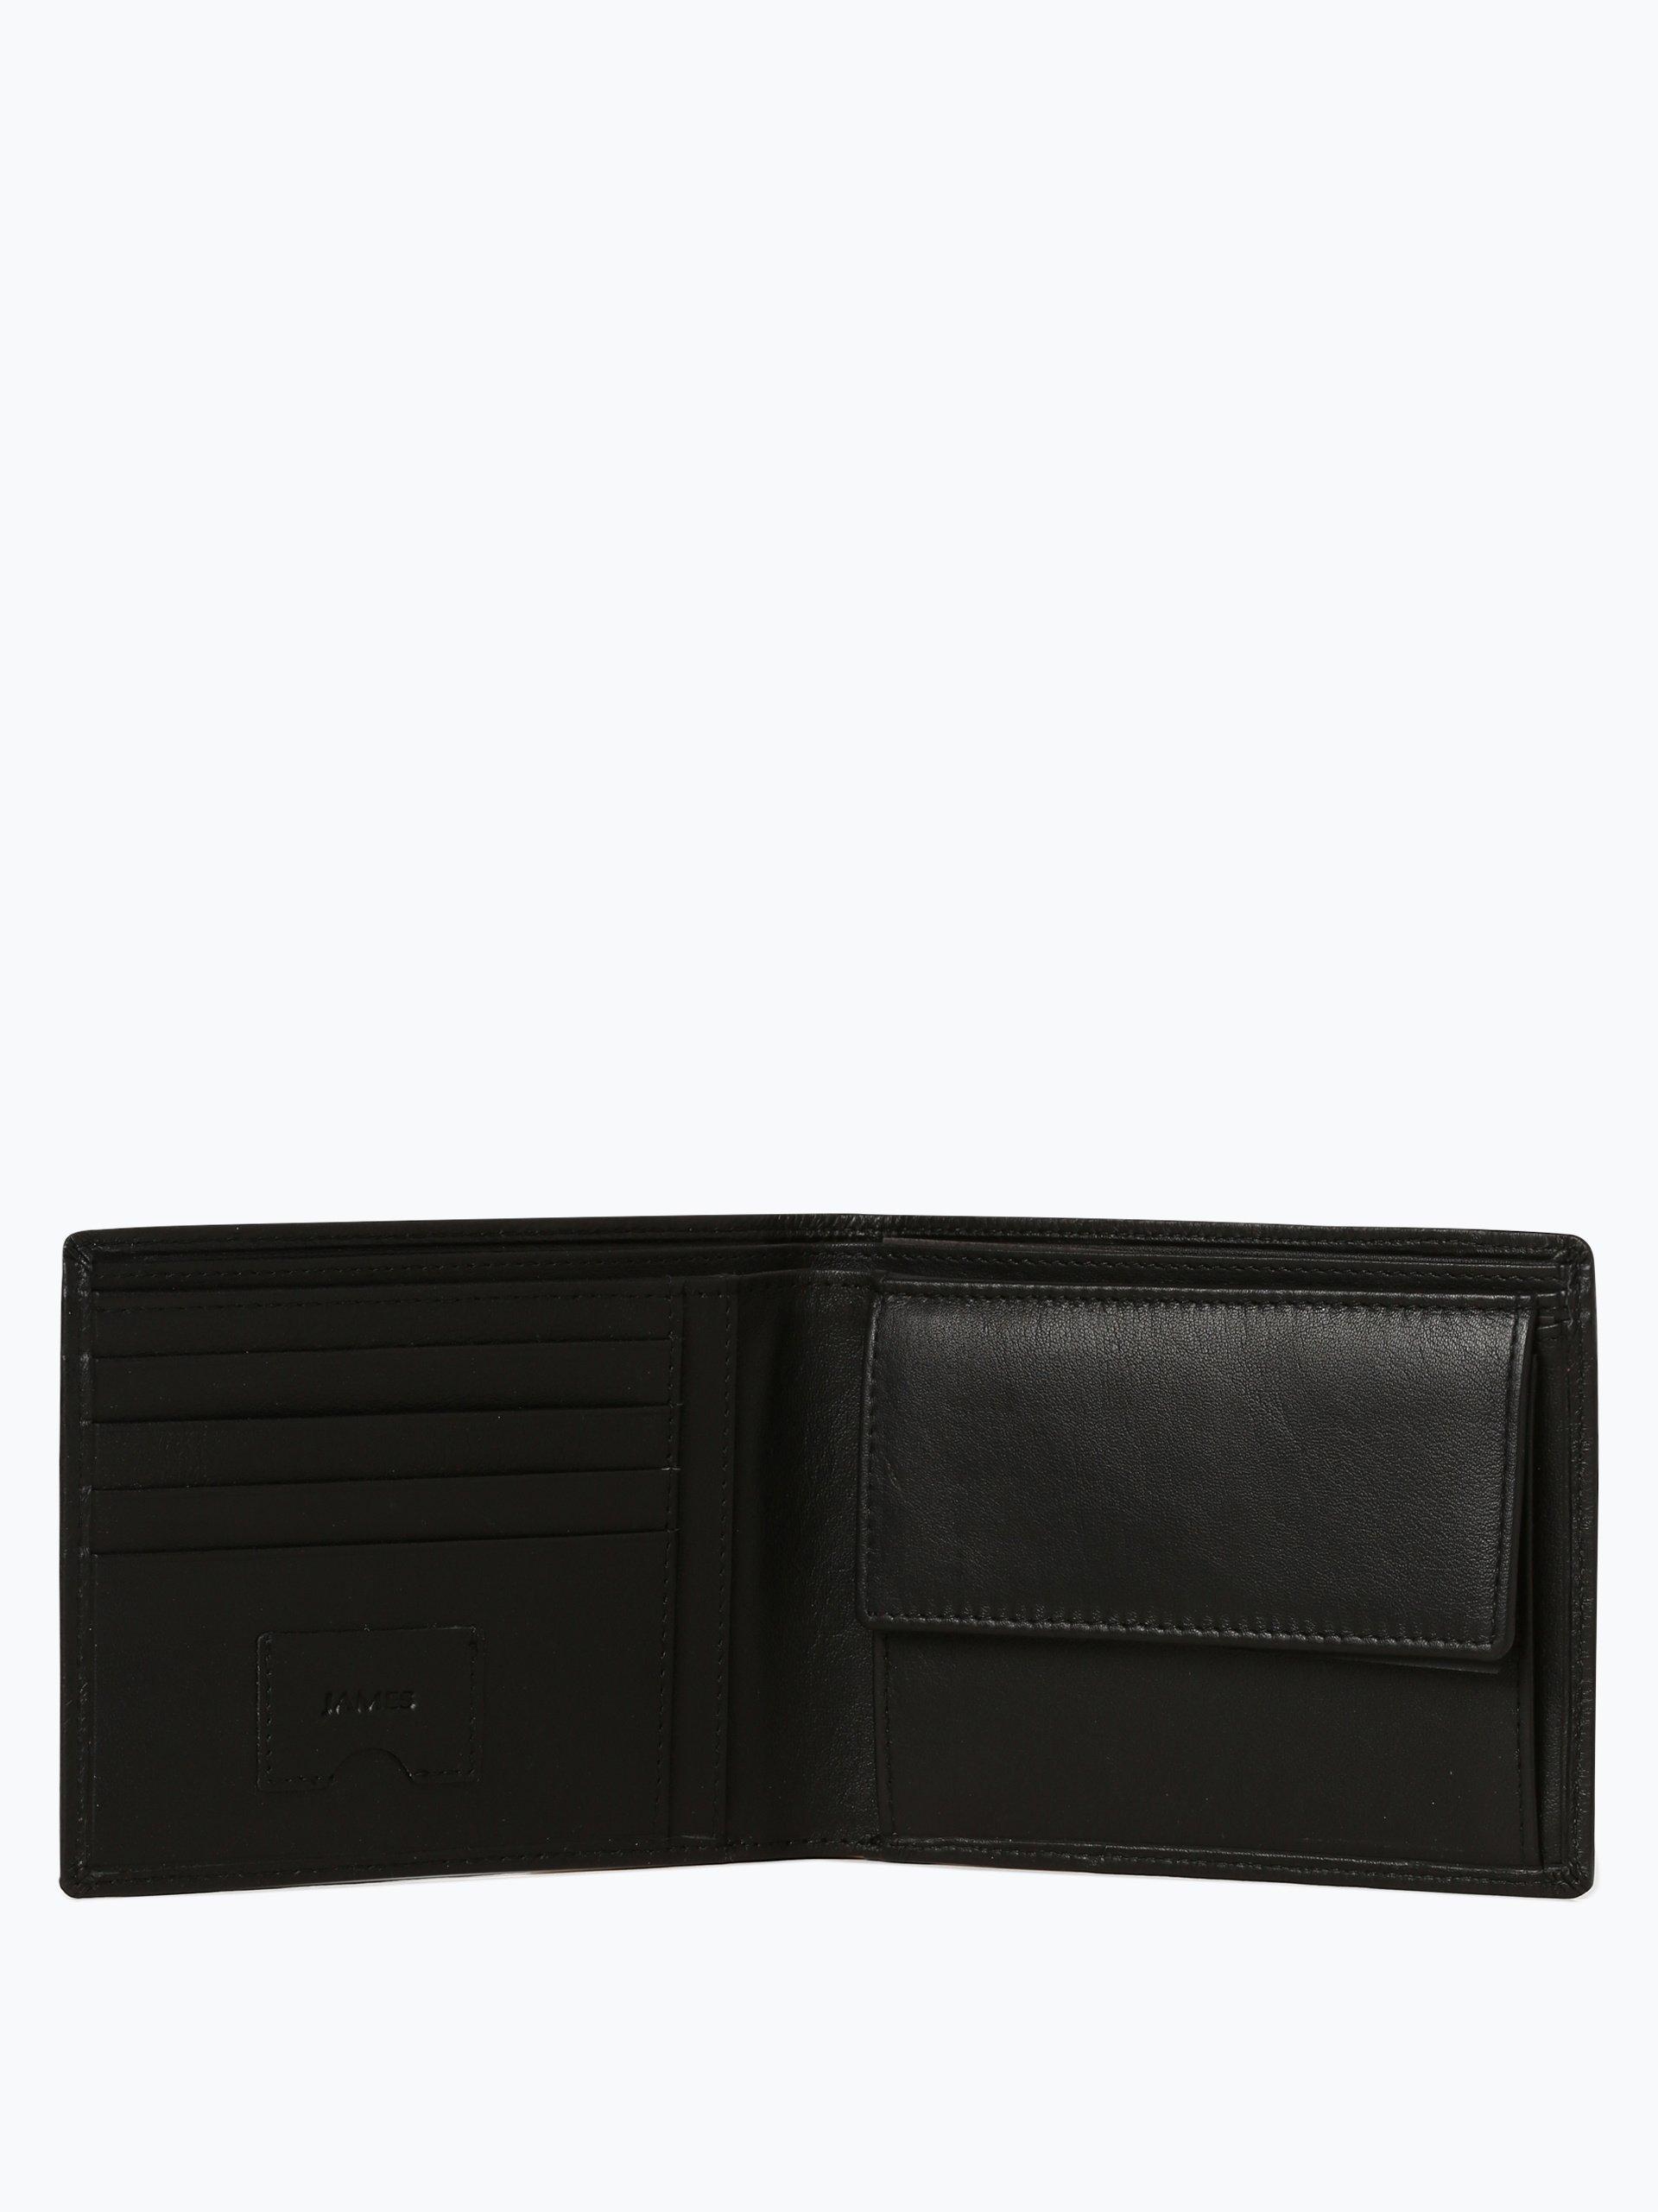 james herren geldb rse aus leder schwarz uni online kaufen vangraaf com. Black Bedroom Furniture Sets. Home Design Ideas